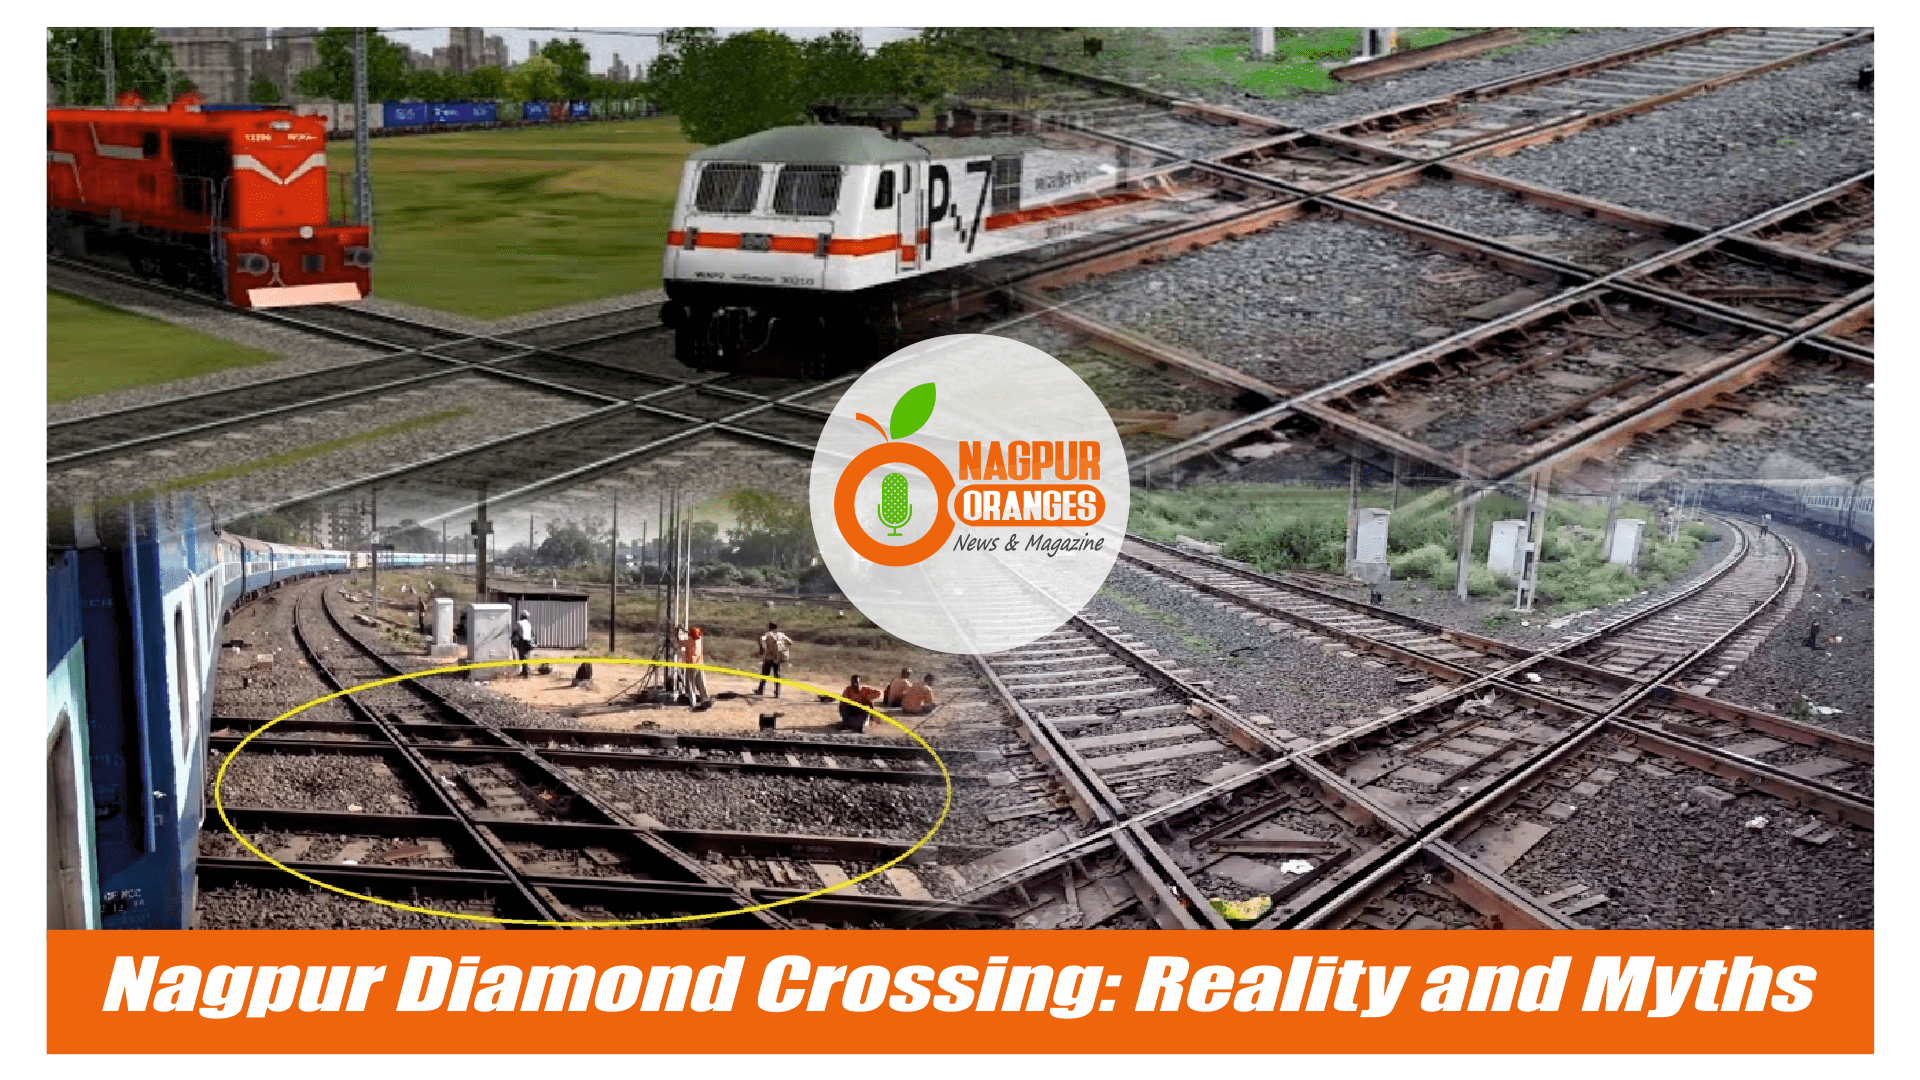 Nagpur Diamond Crossing